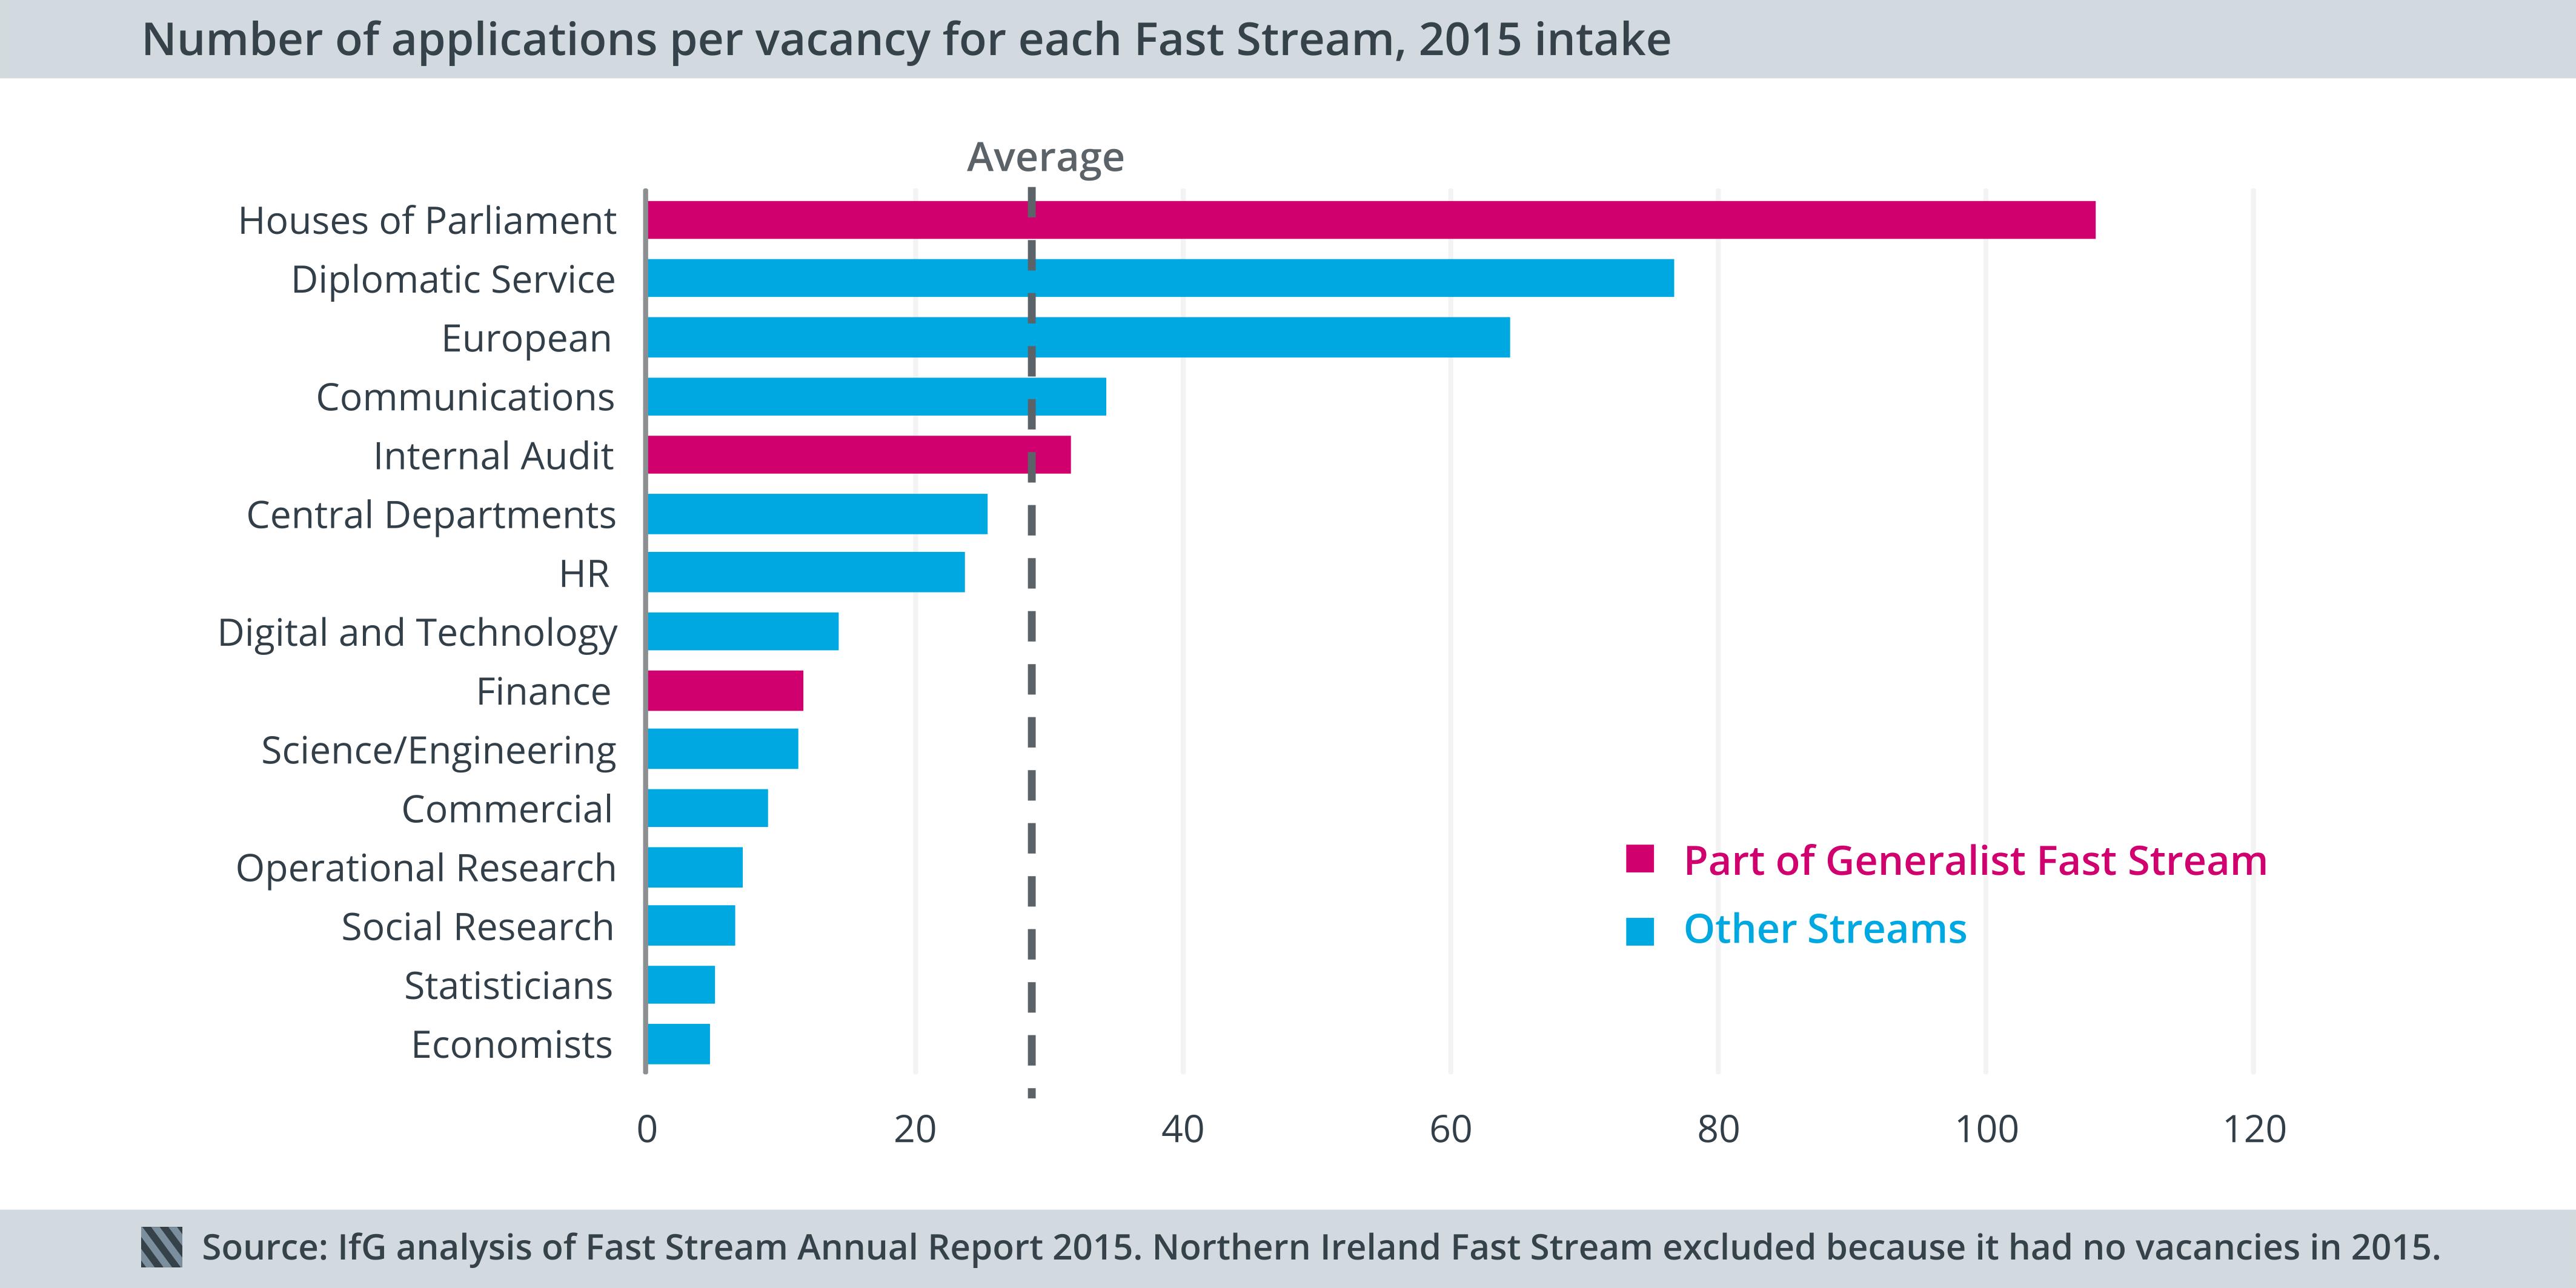 Applications per vacancy - Civil Service Fast Stream